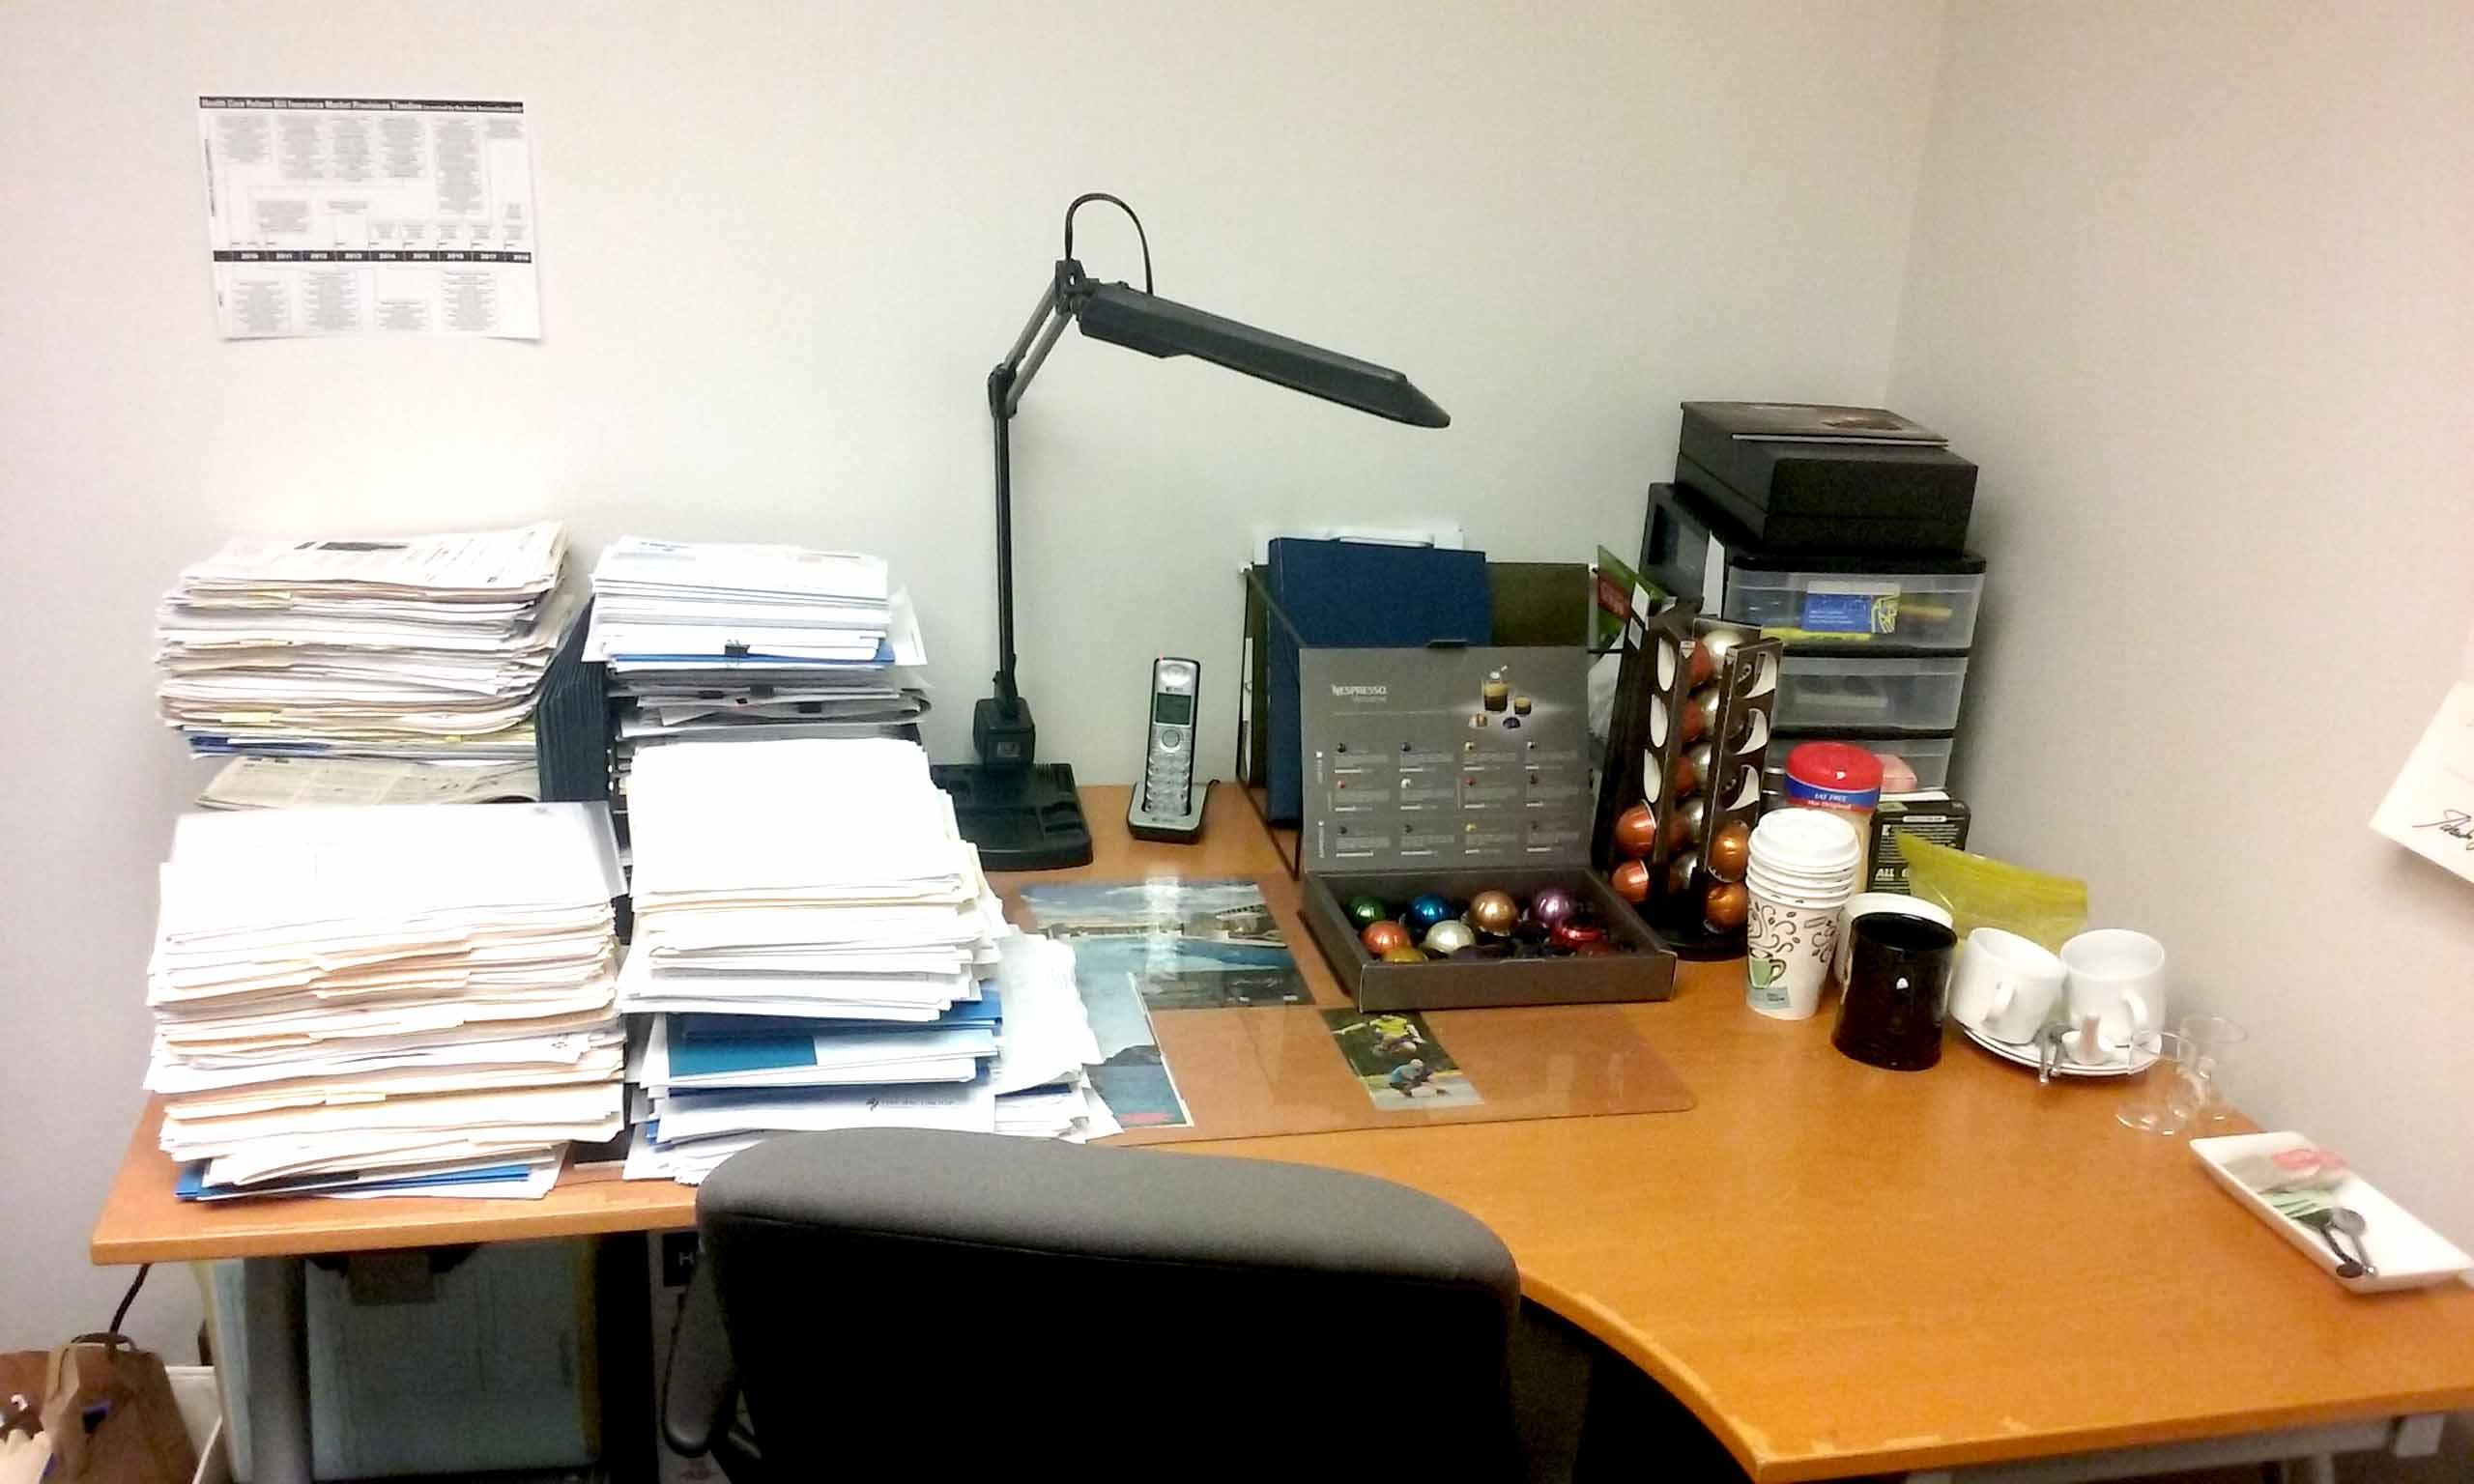 deskwork